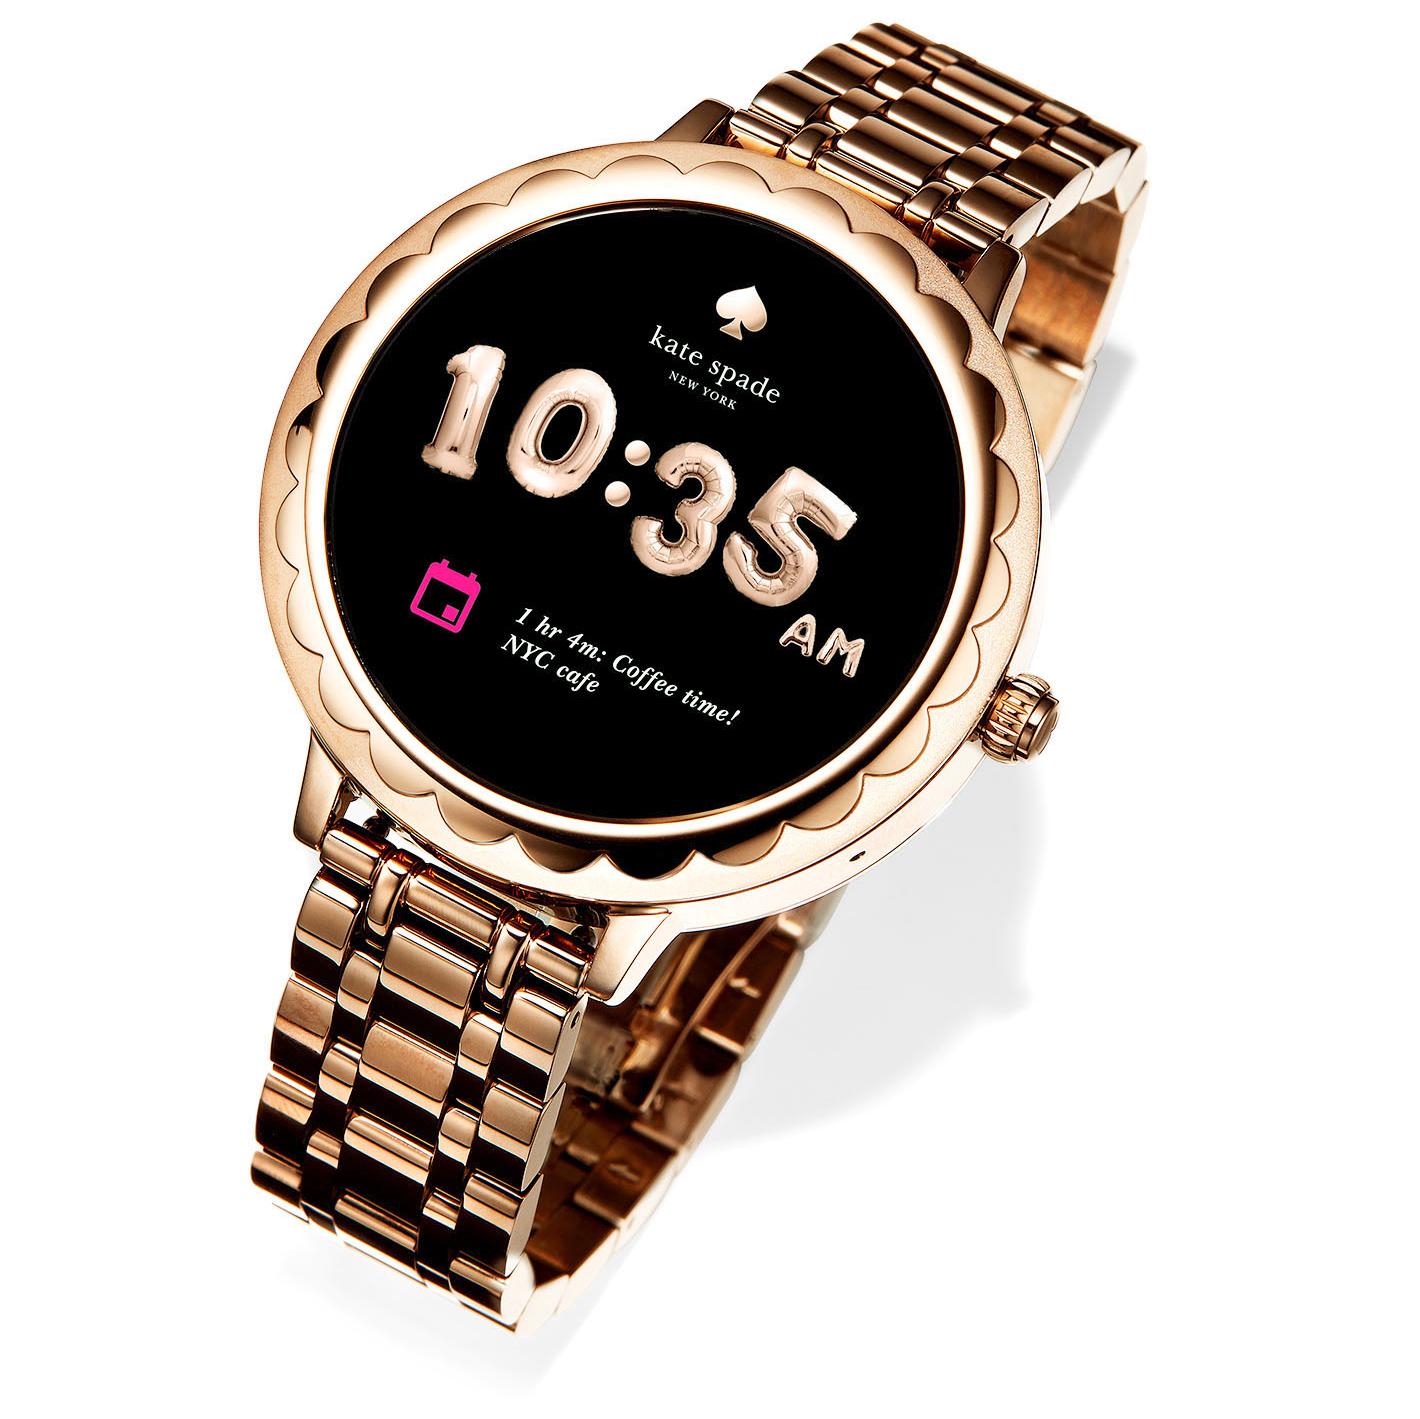 kate spade new york scallop touchscreen watch